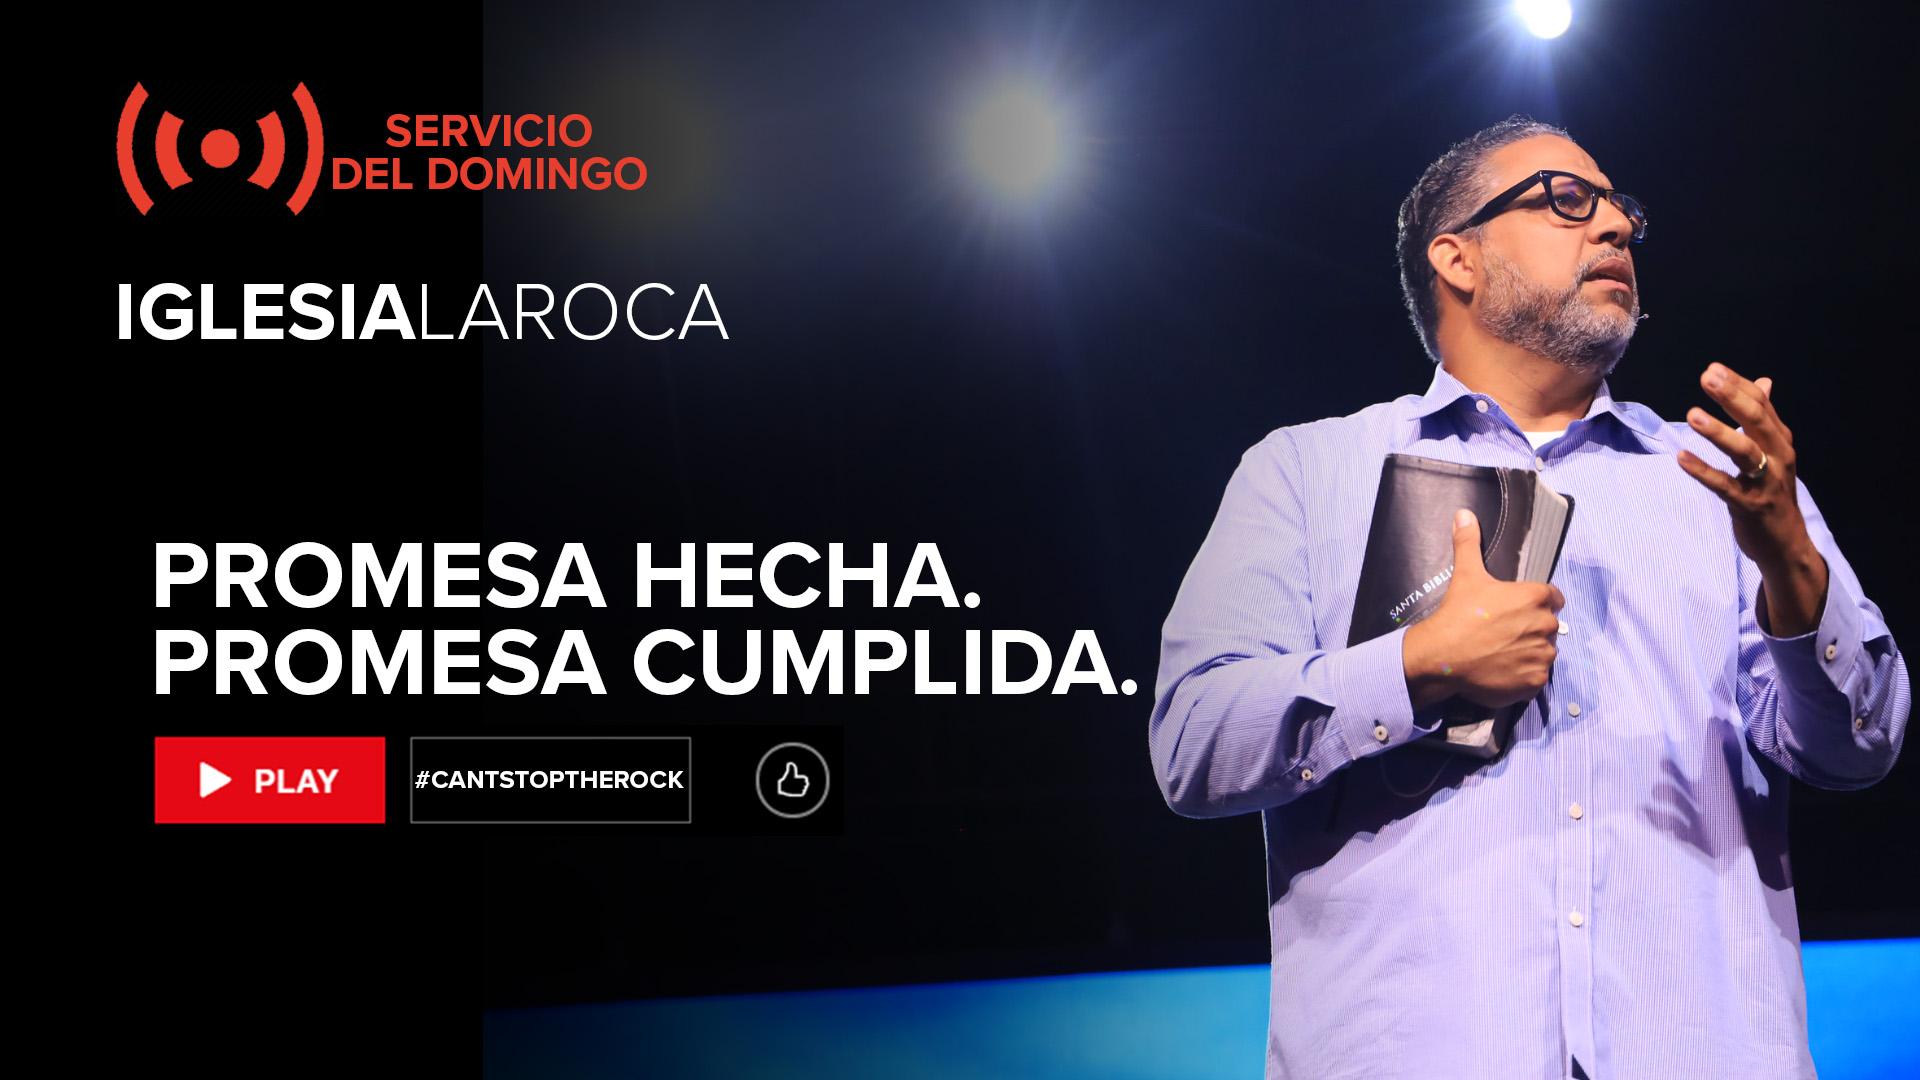 Watch Promesa Hecha. Promesa Cumplida.